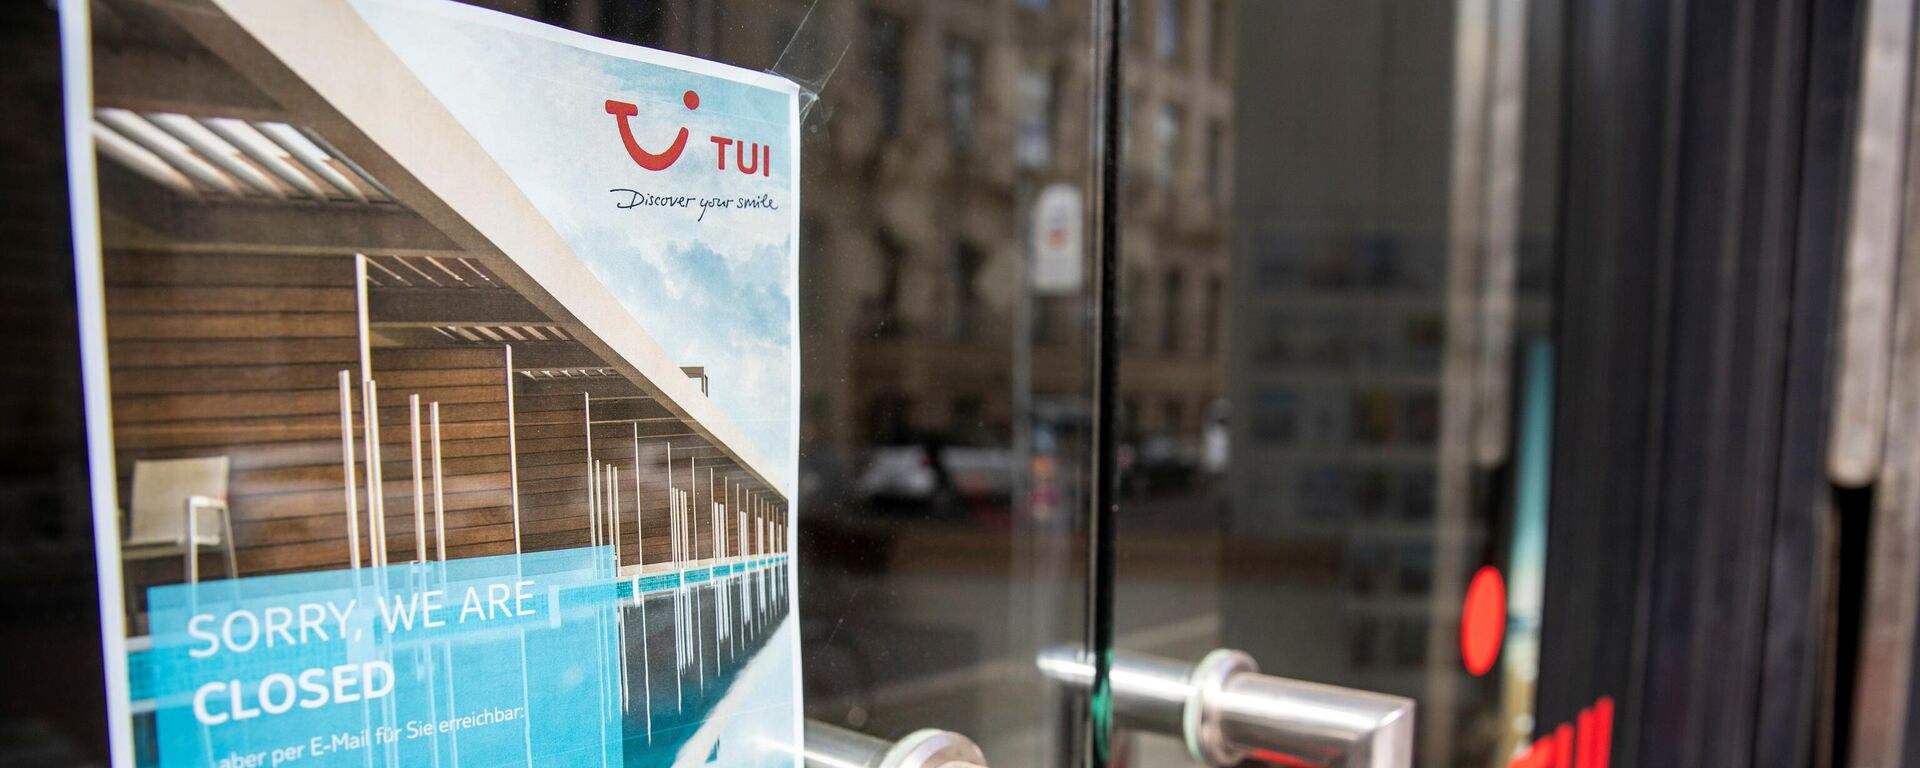 Ein Tui-Reisebüro, das coronabedingt geschlossen bleiben muss.  - SNA, 1920, 04.01.2021